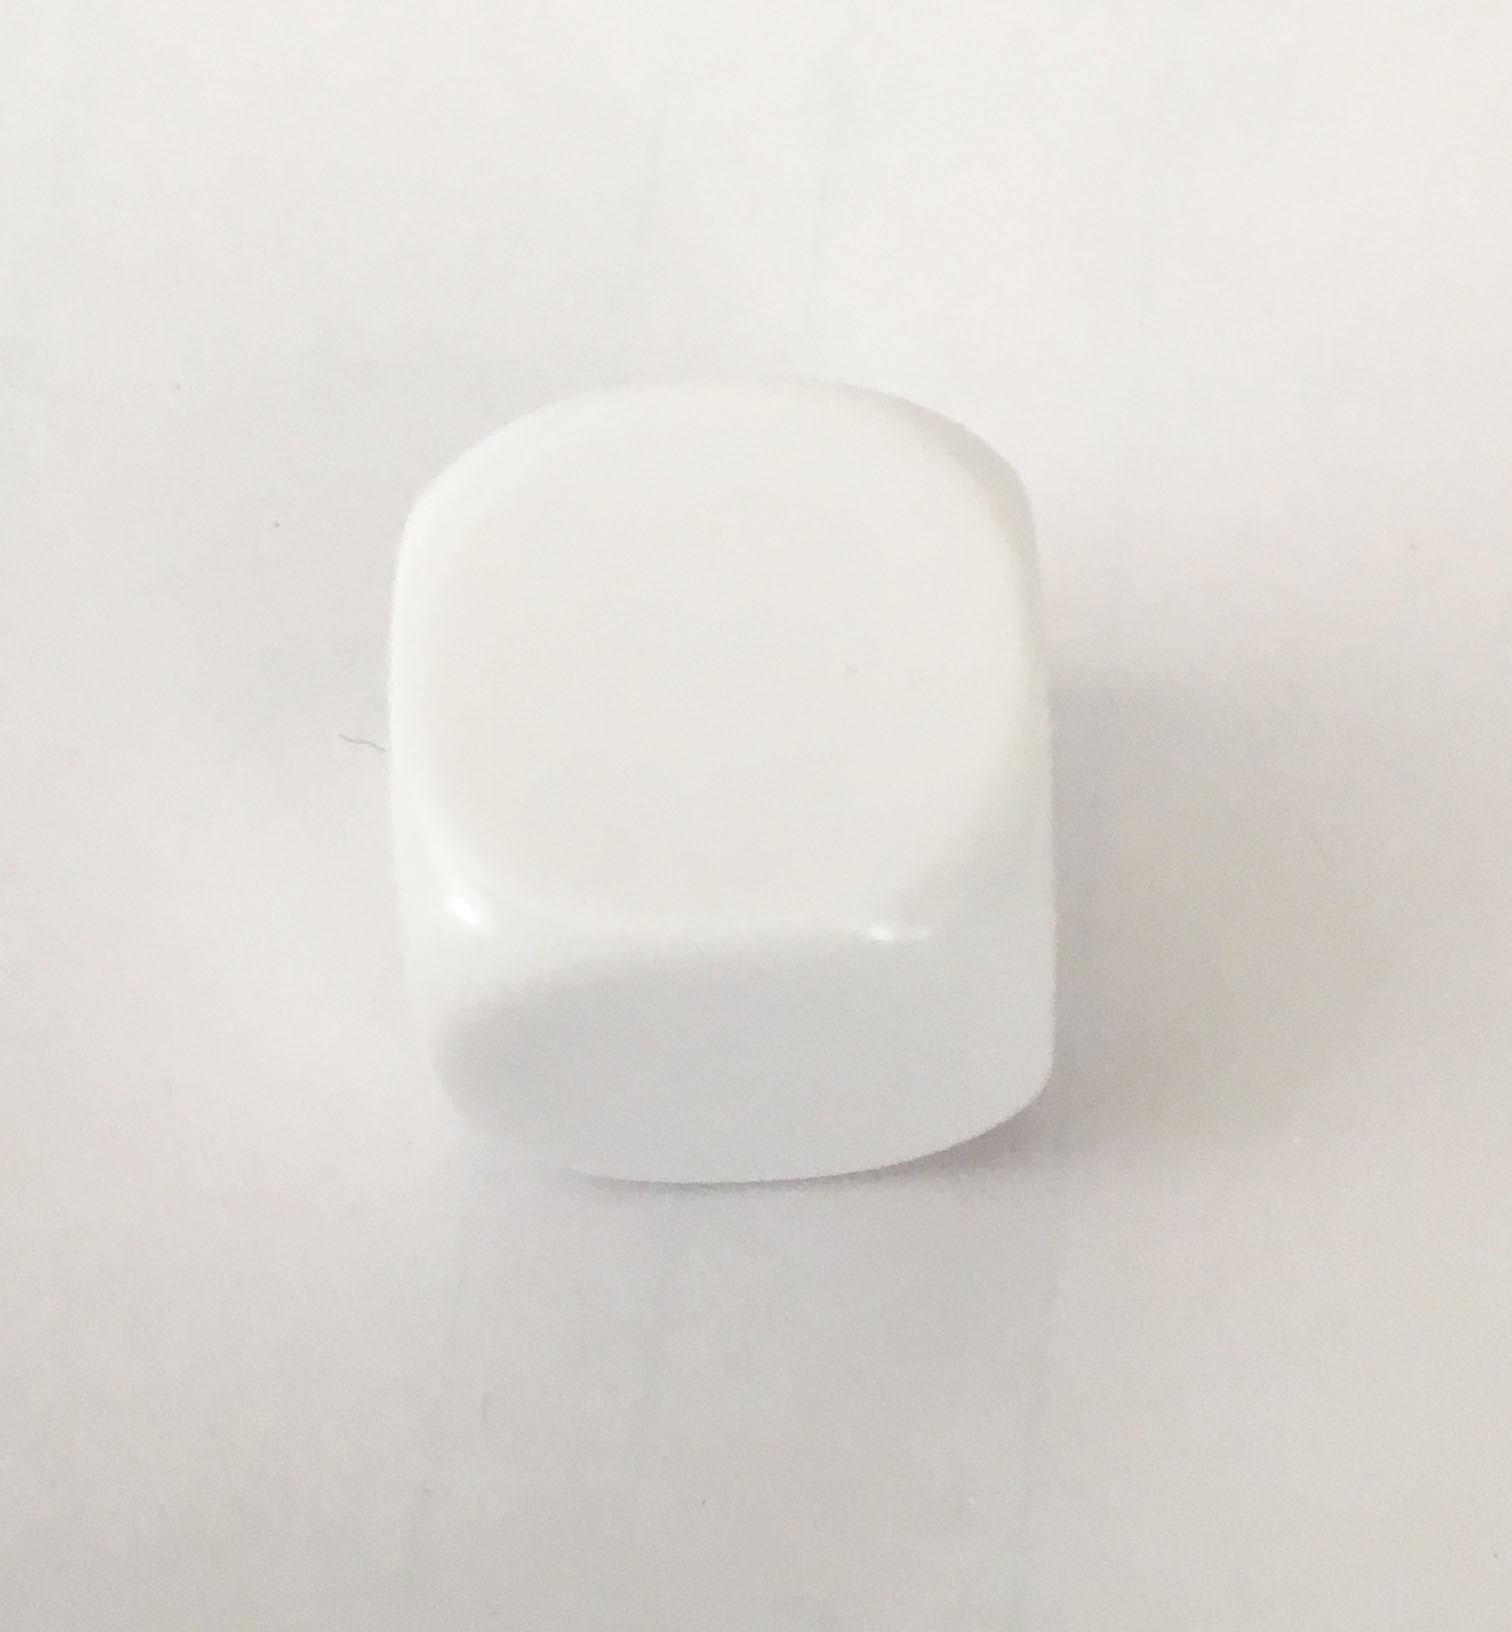 14mm Blank White Single